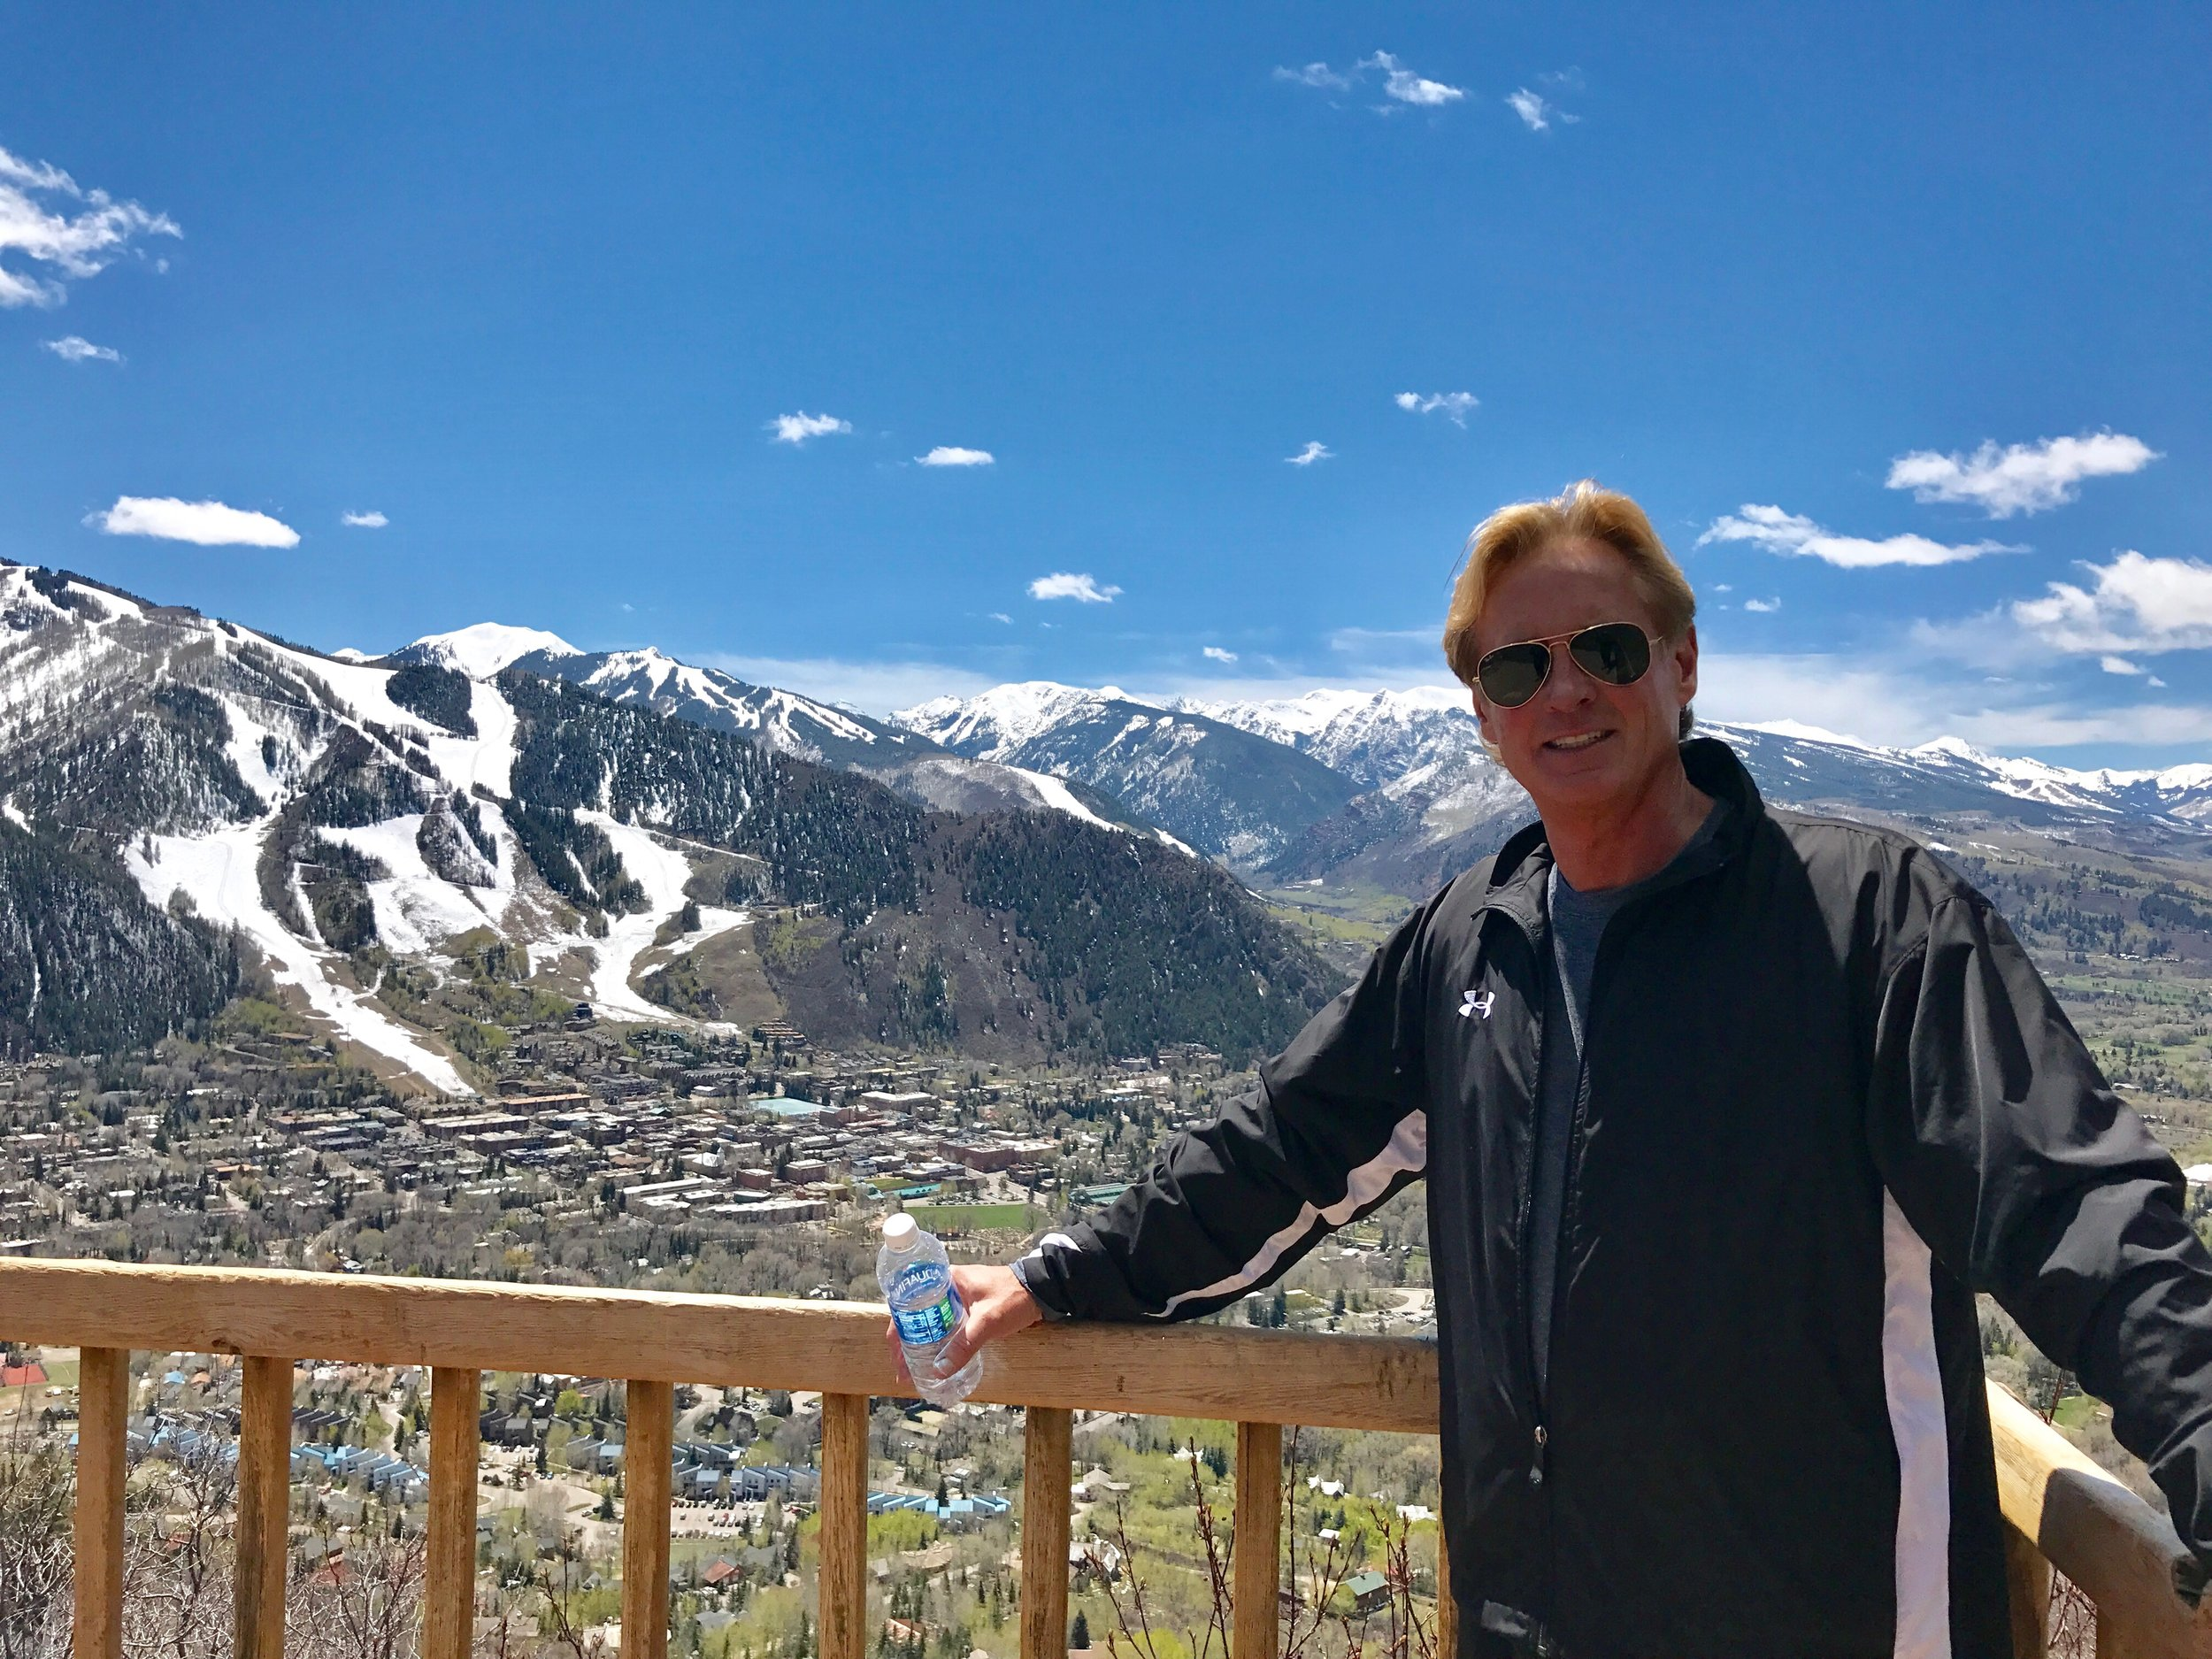 Smuggler Mountain Trailhead